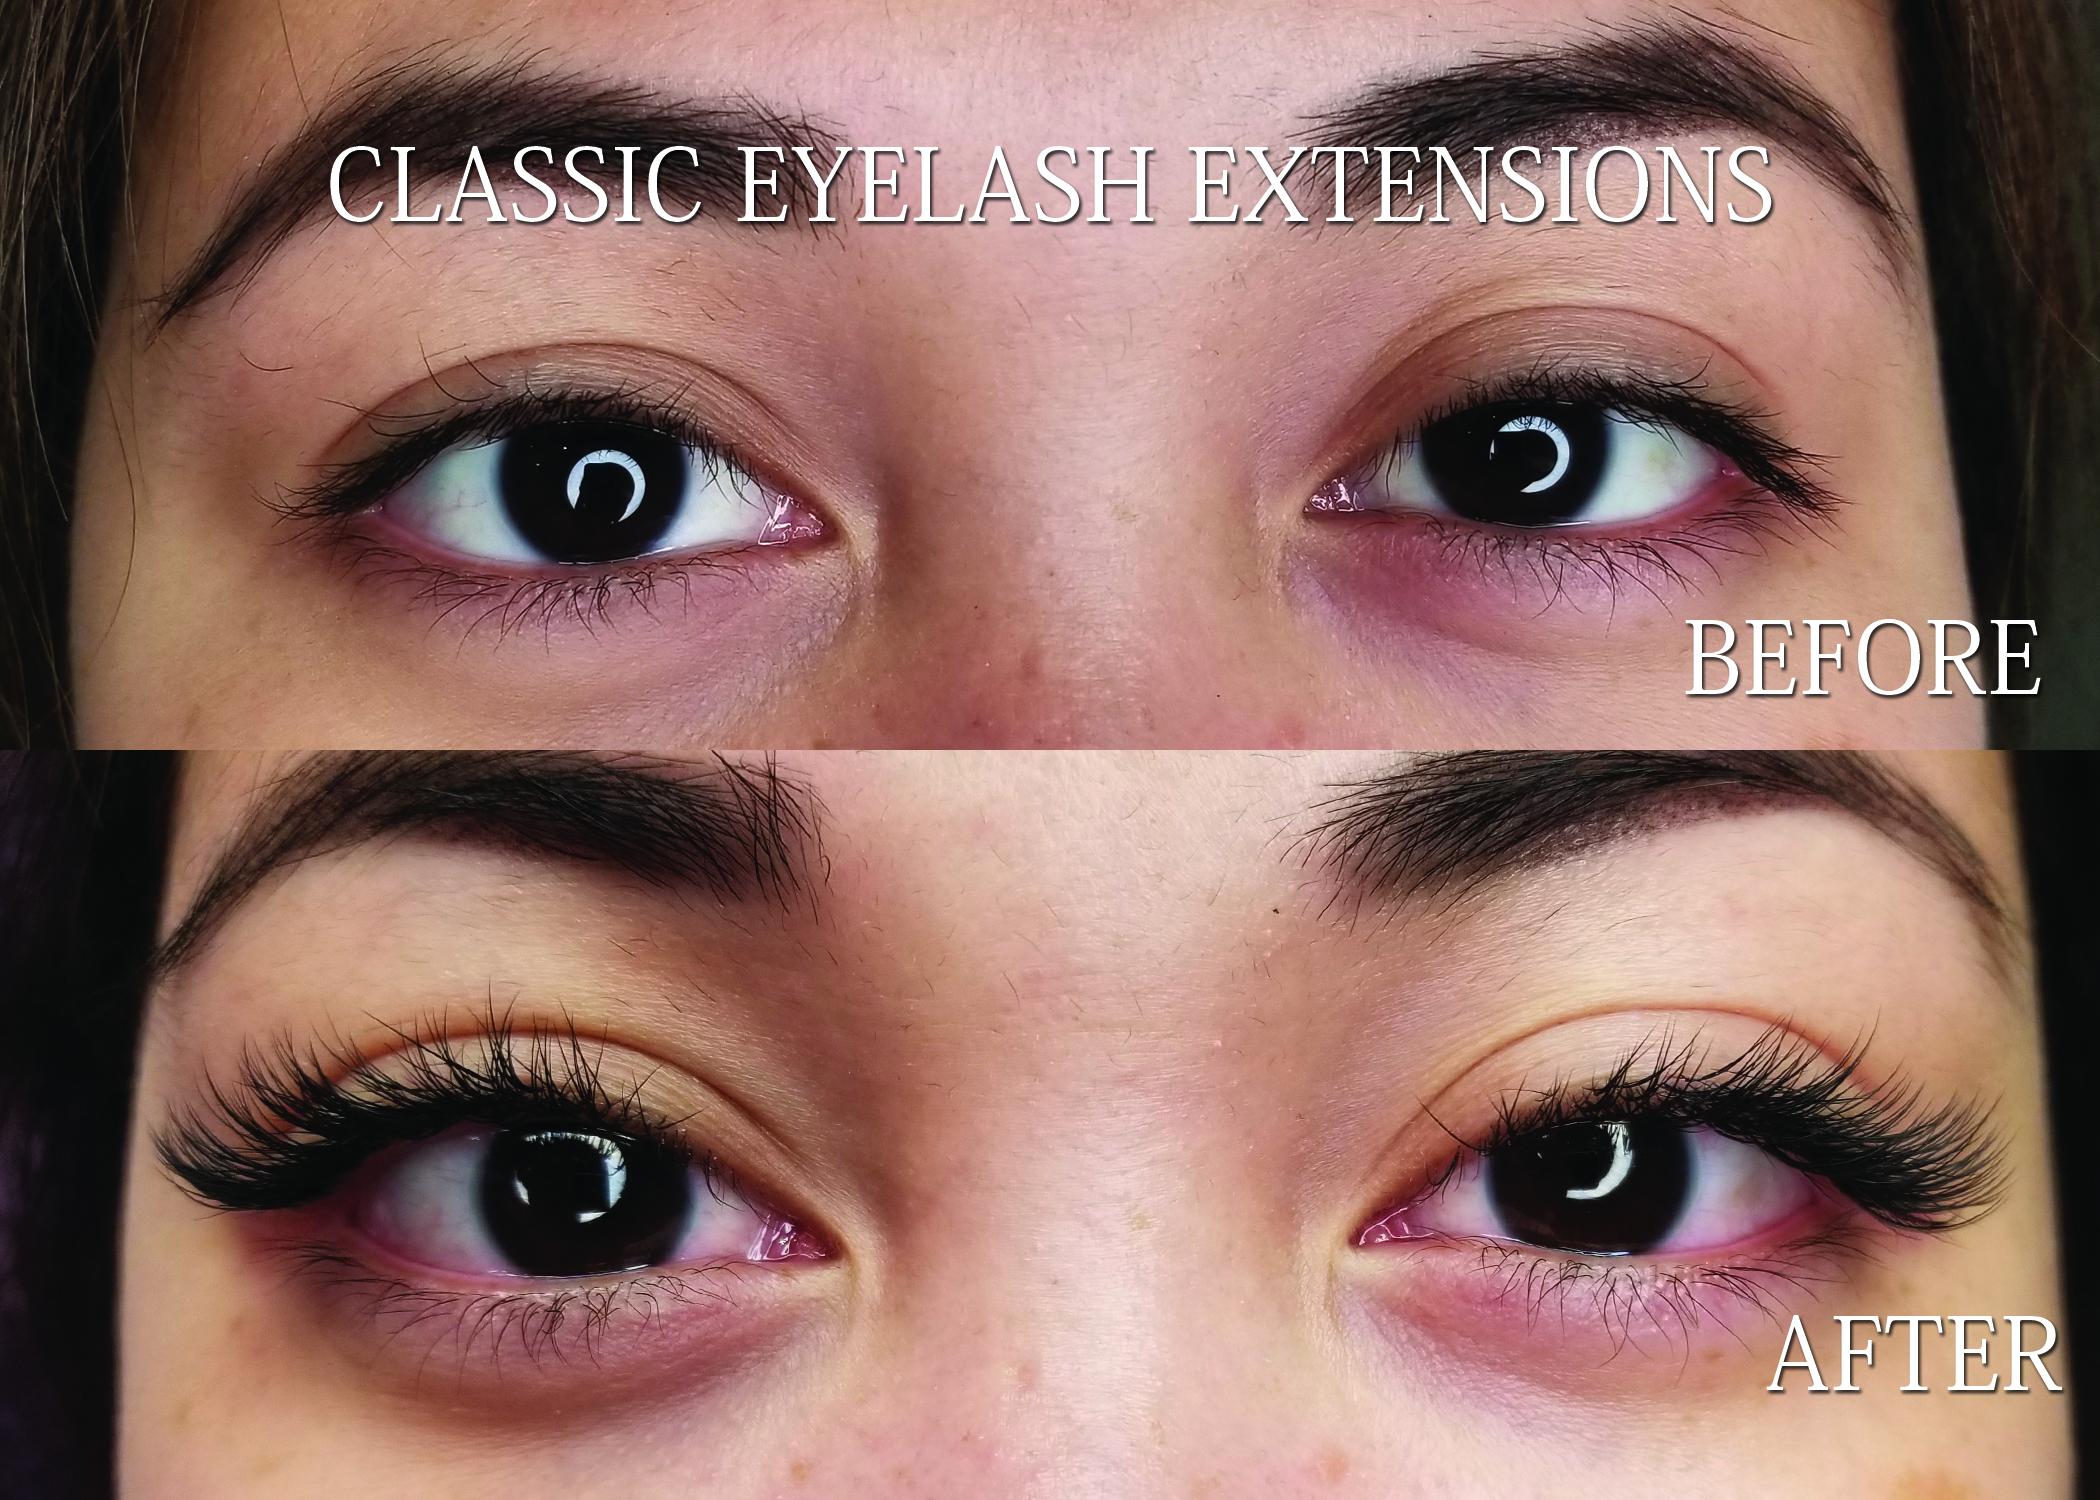 ClassicEyelashExtensions2.jpg